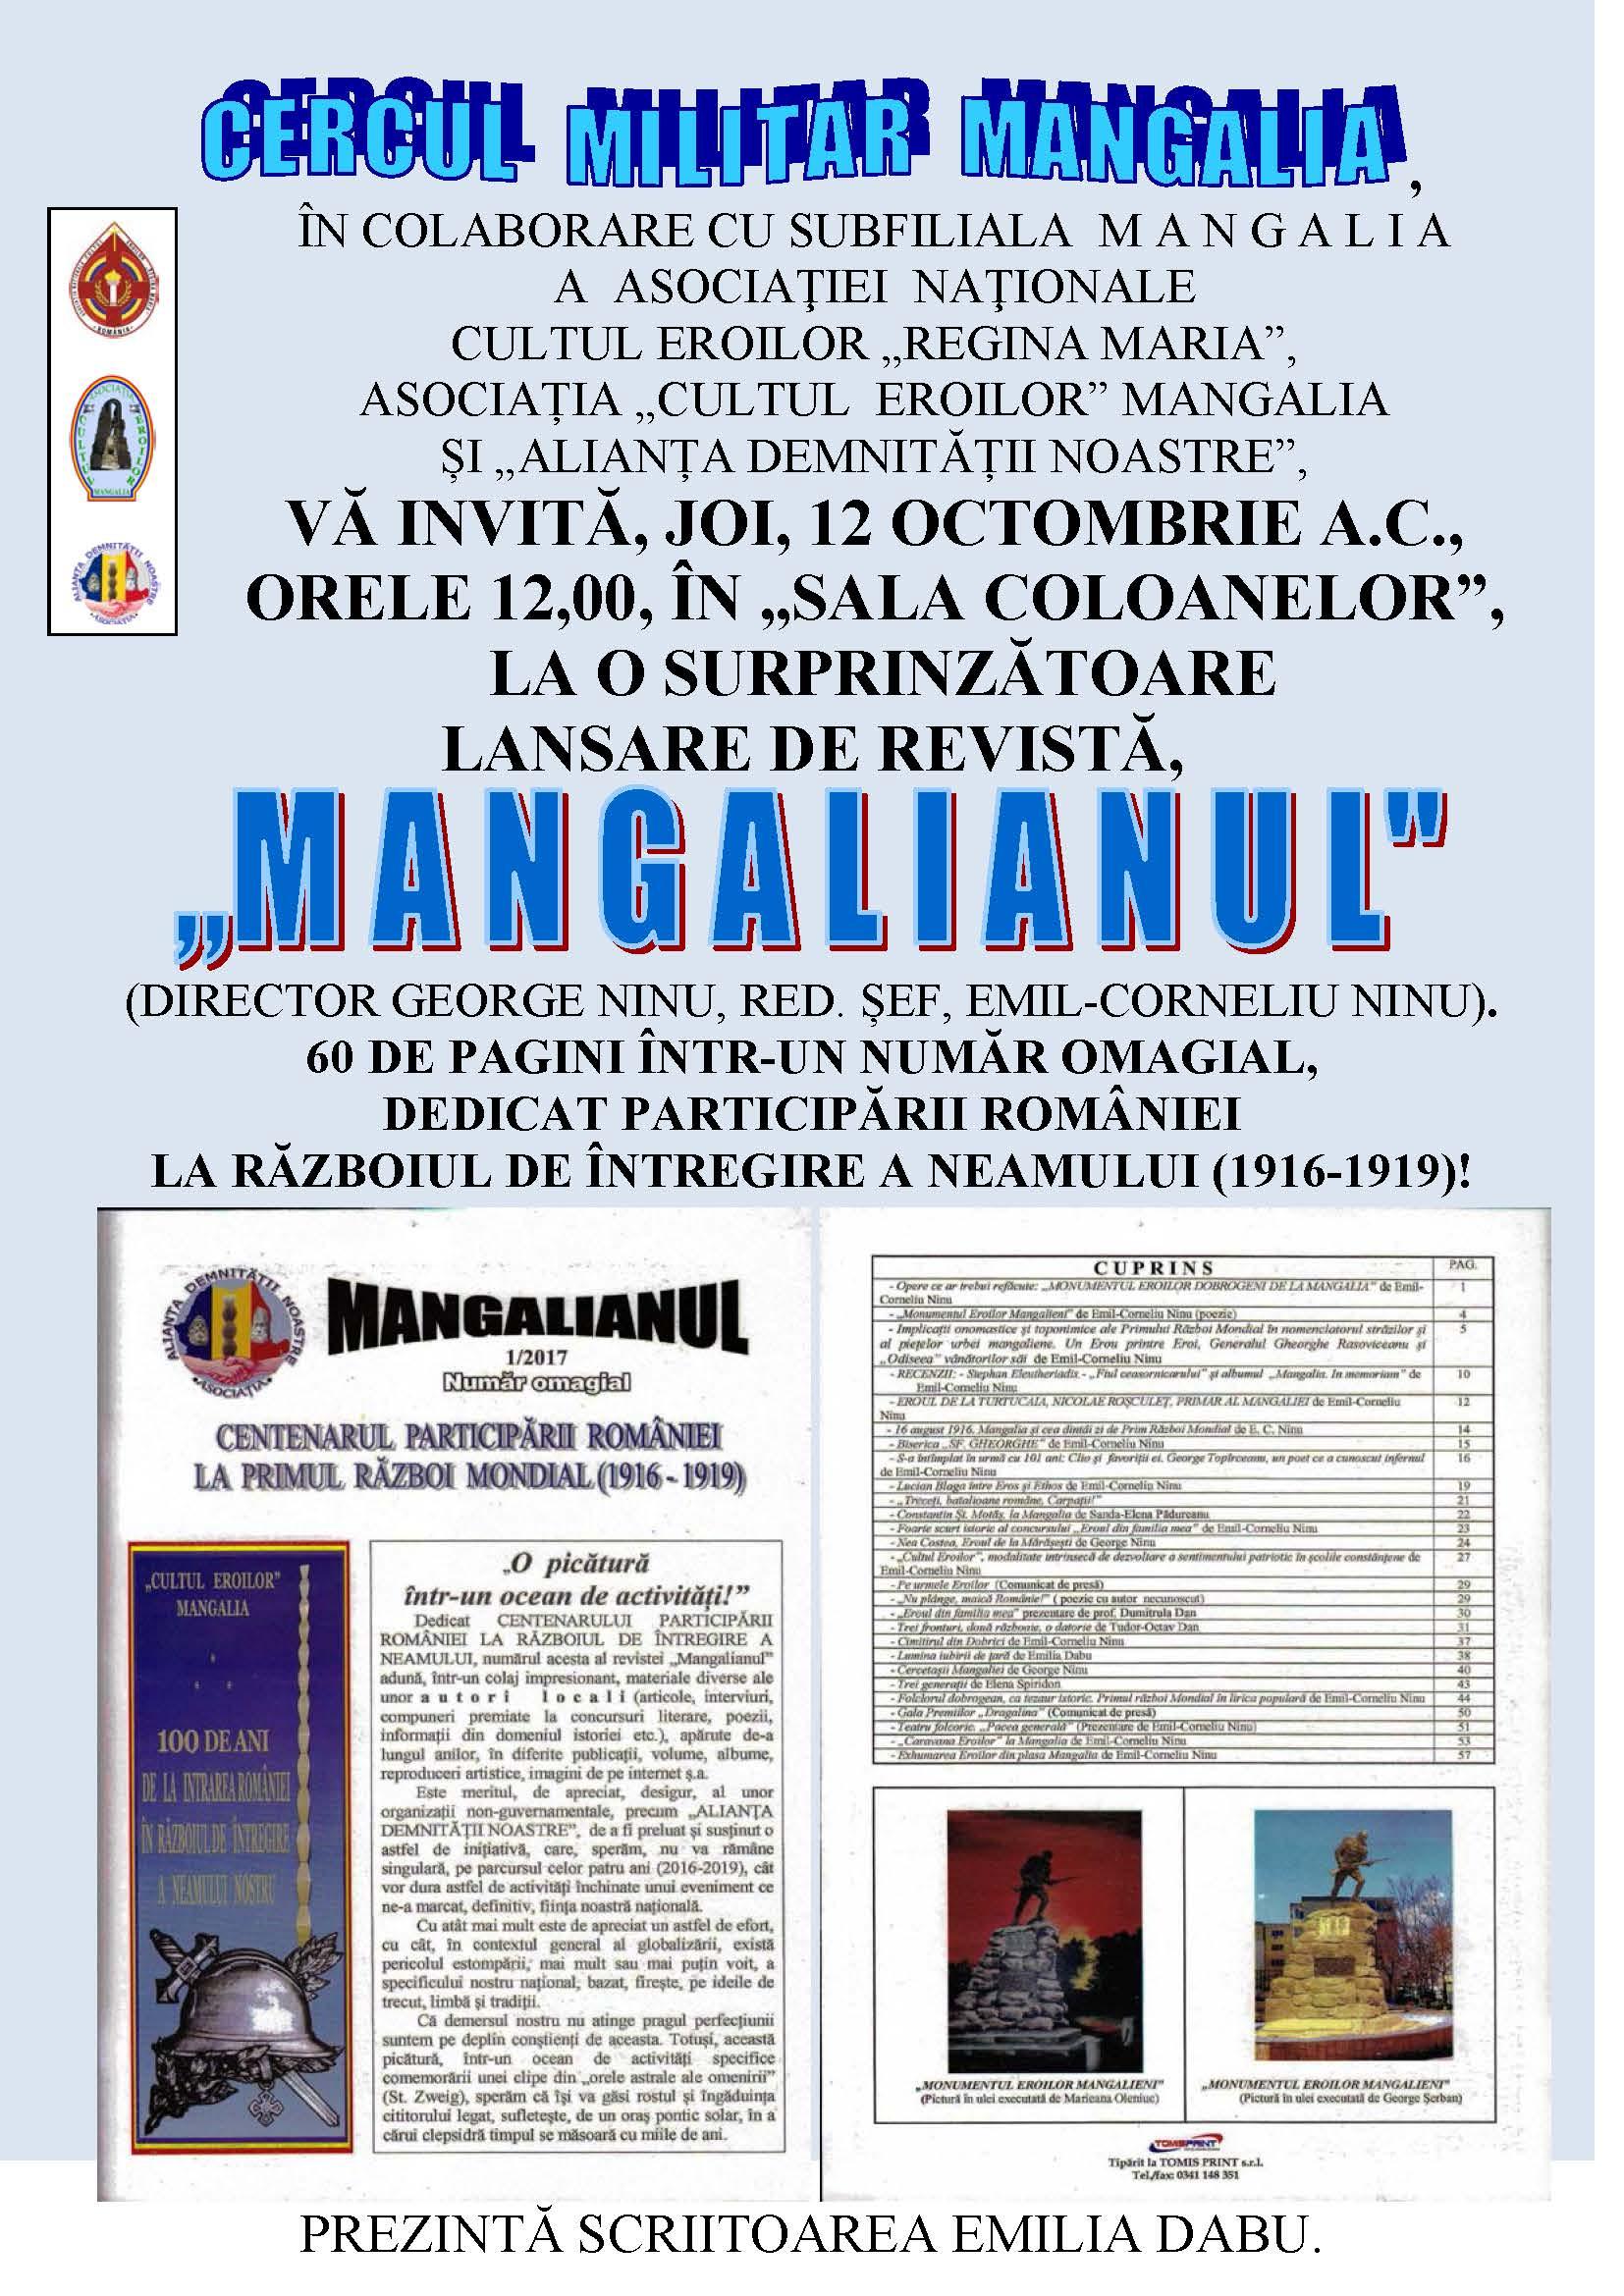 "Lansare rev. ""MANGALIANUL"", 12.10.2017"